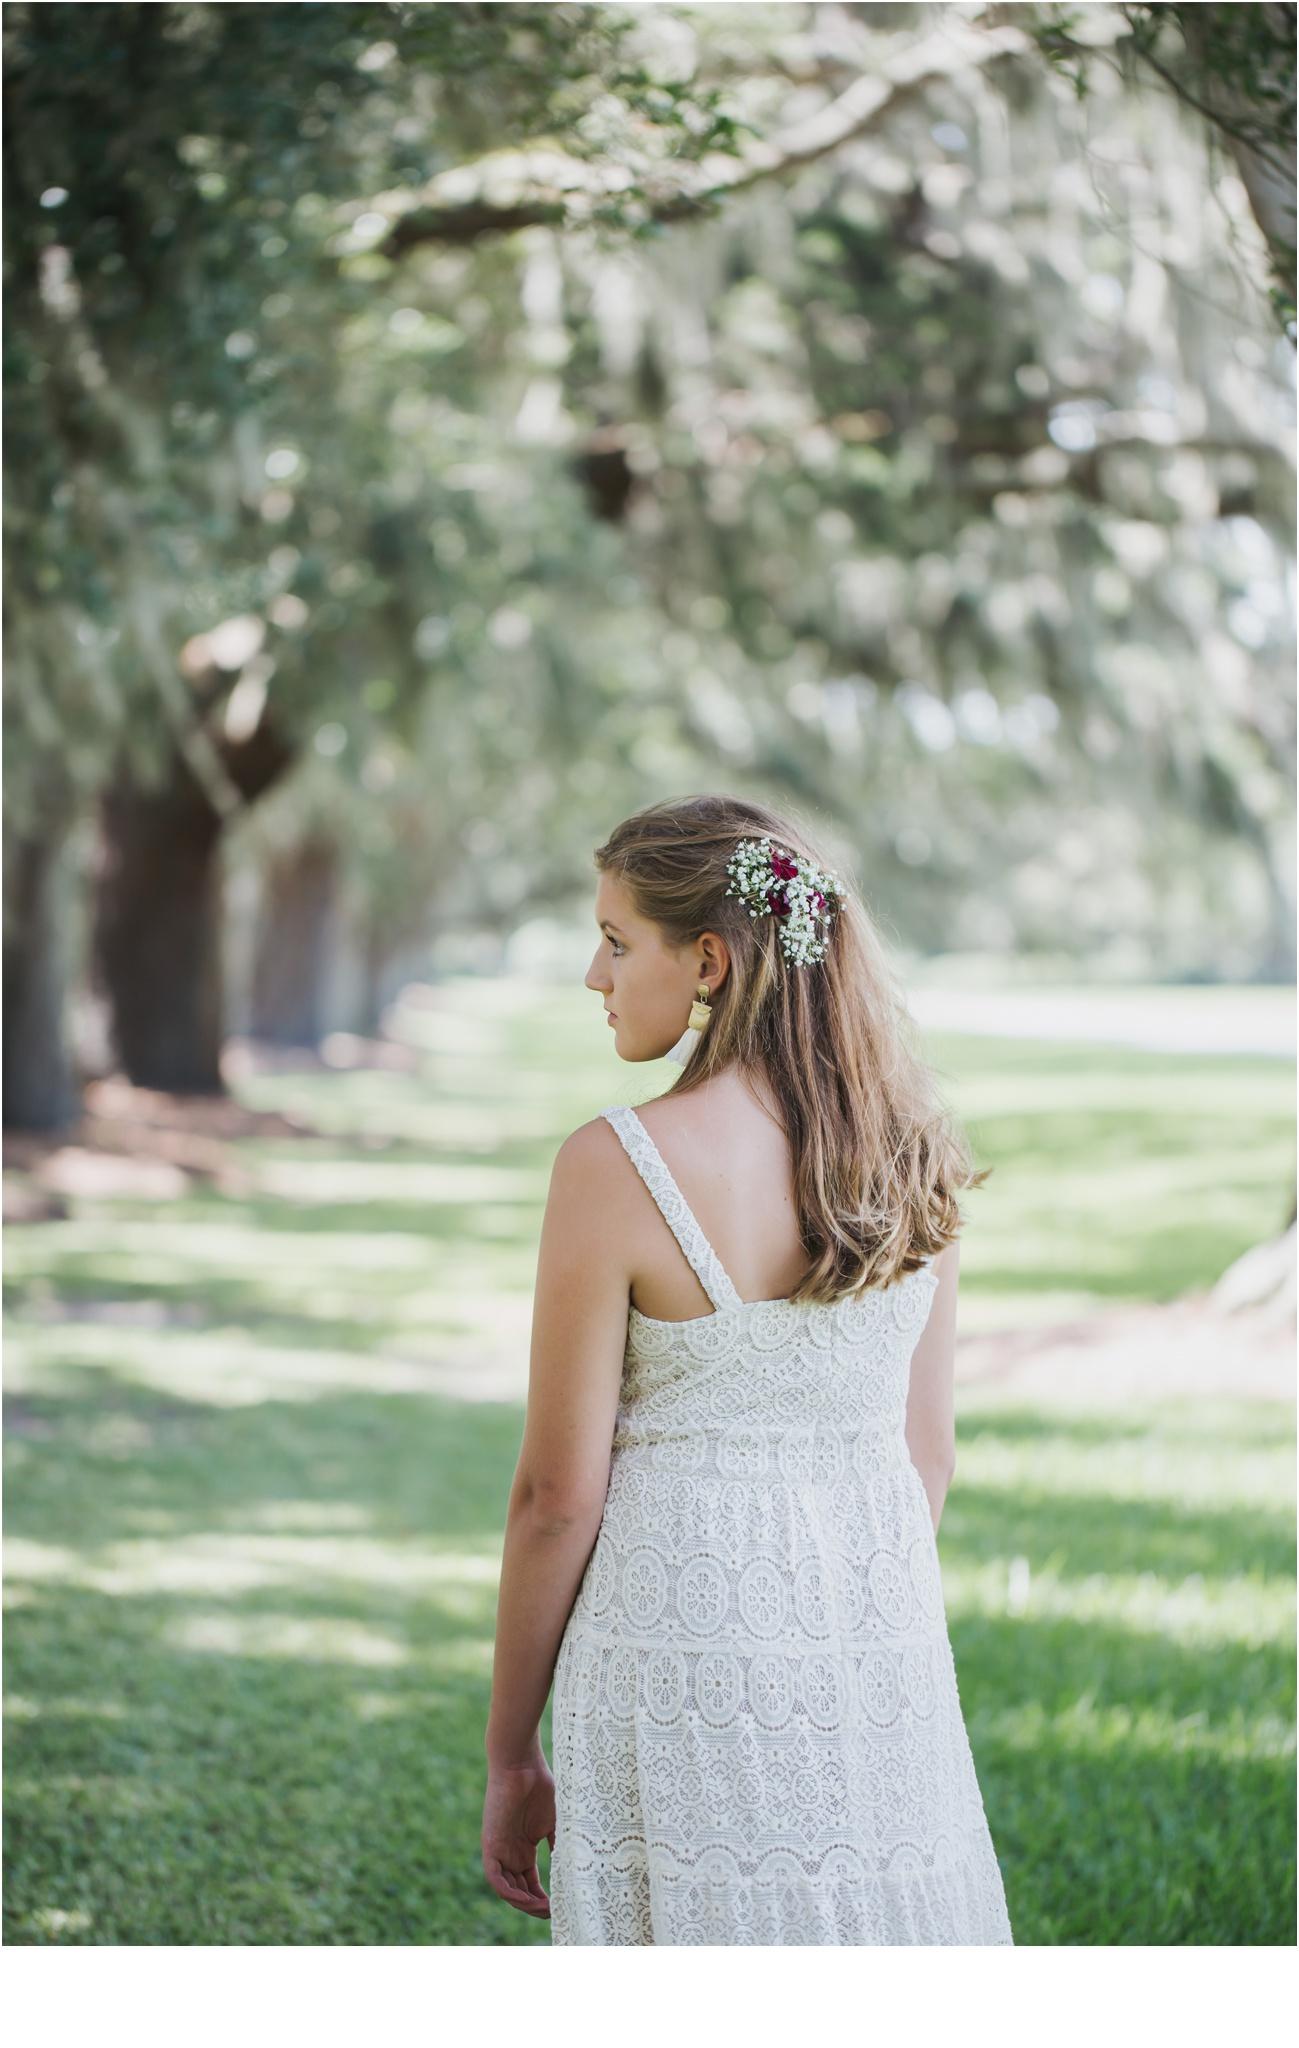 Rainey_Gregg_Photography_St._Simons_Island_Georgia_California_Wedding_Portrait_Photography_1108.jpg